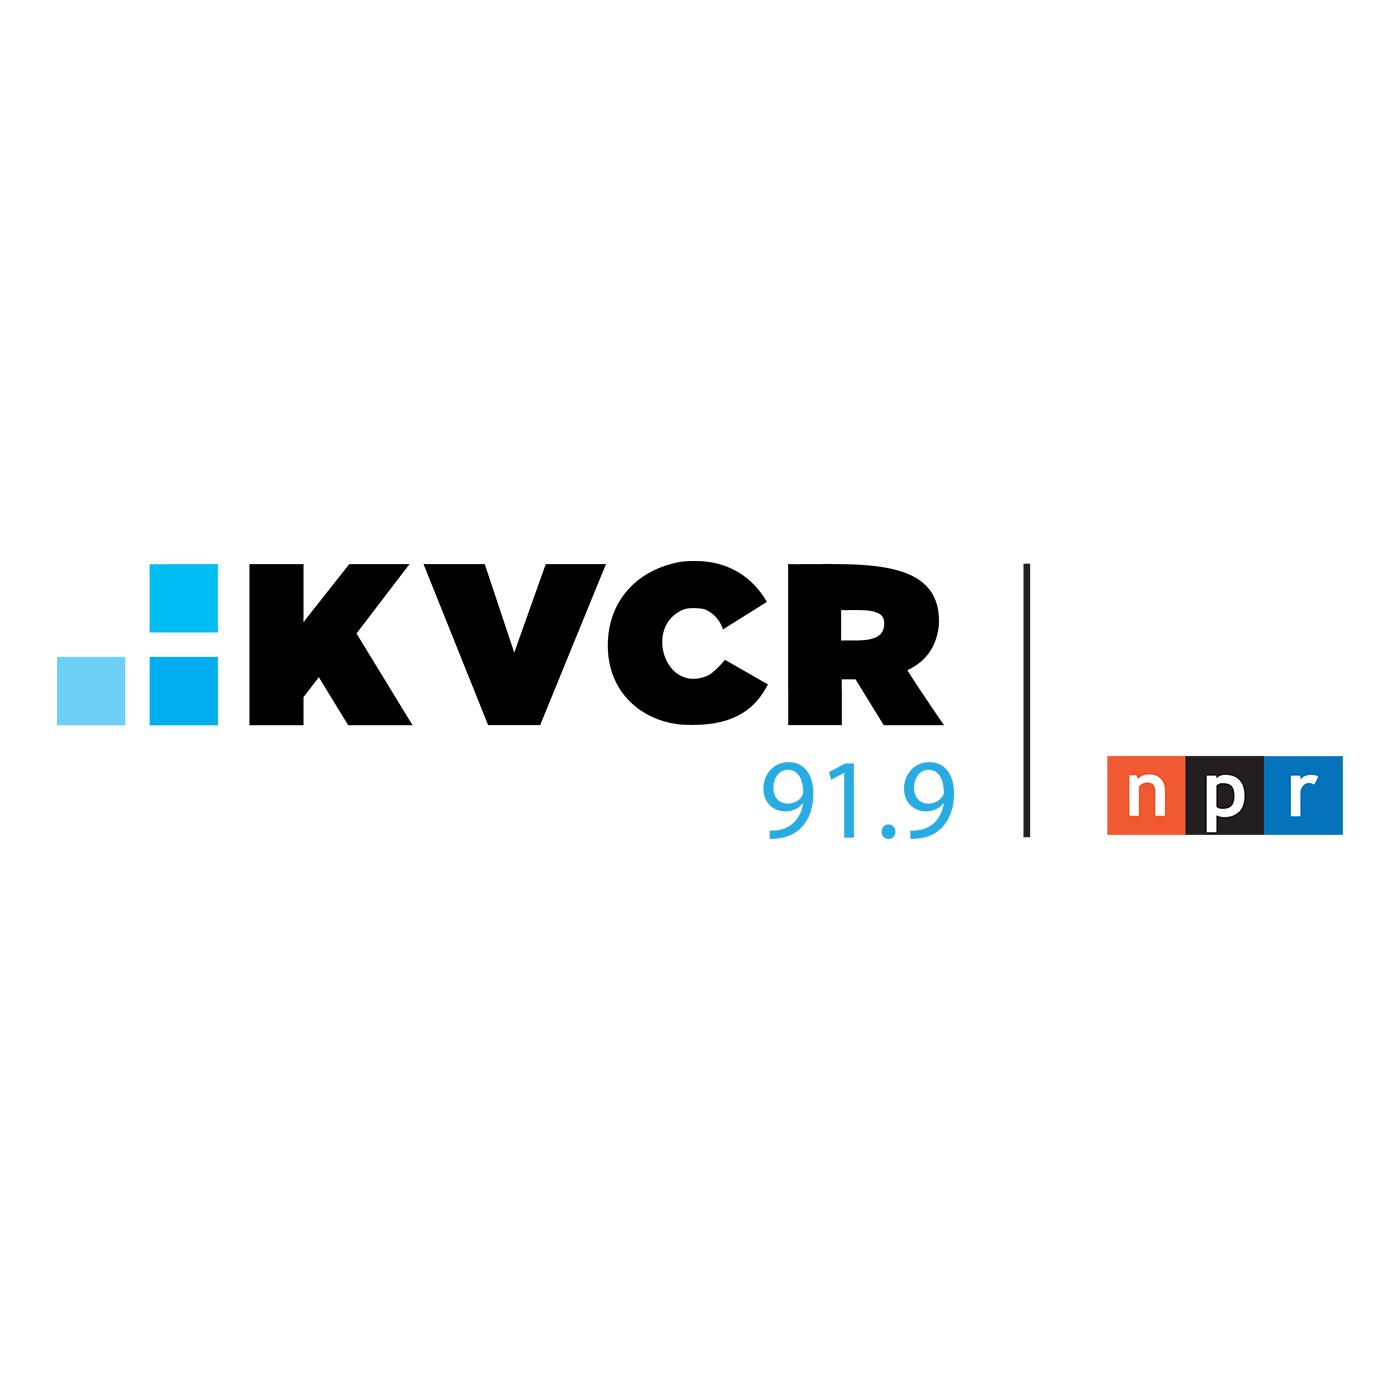 KVCR-FM: Assorted stories from KVCR-FM : NPR